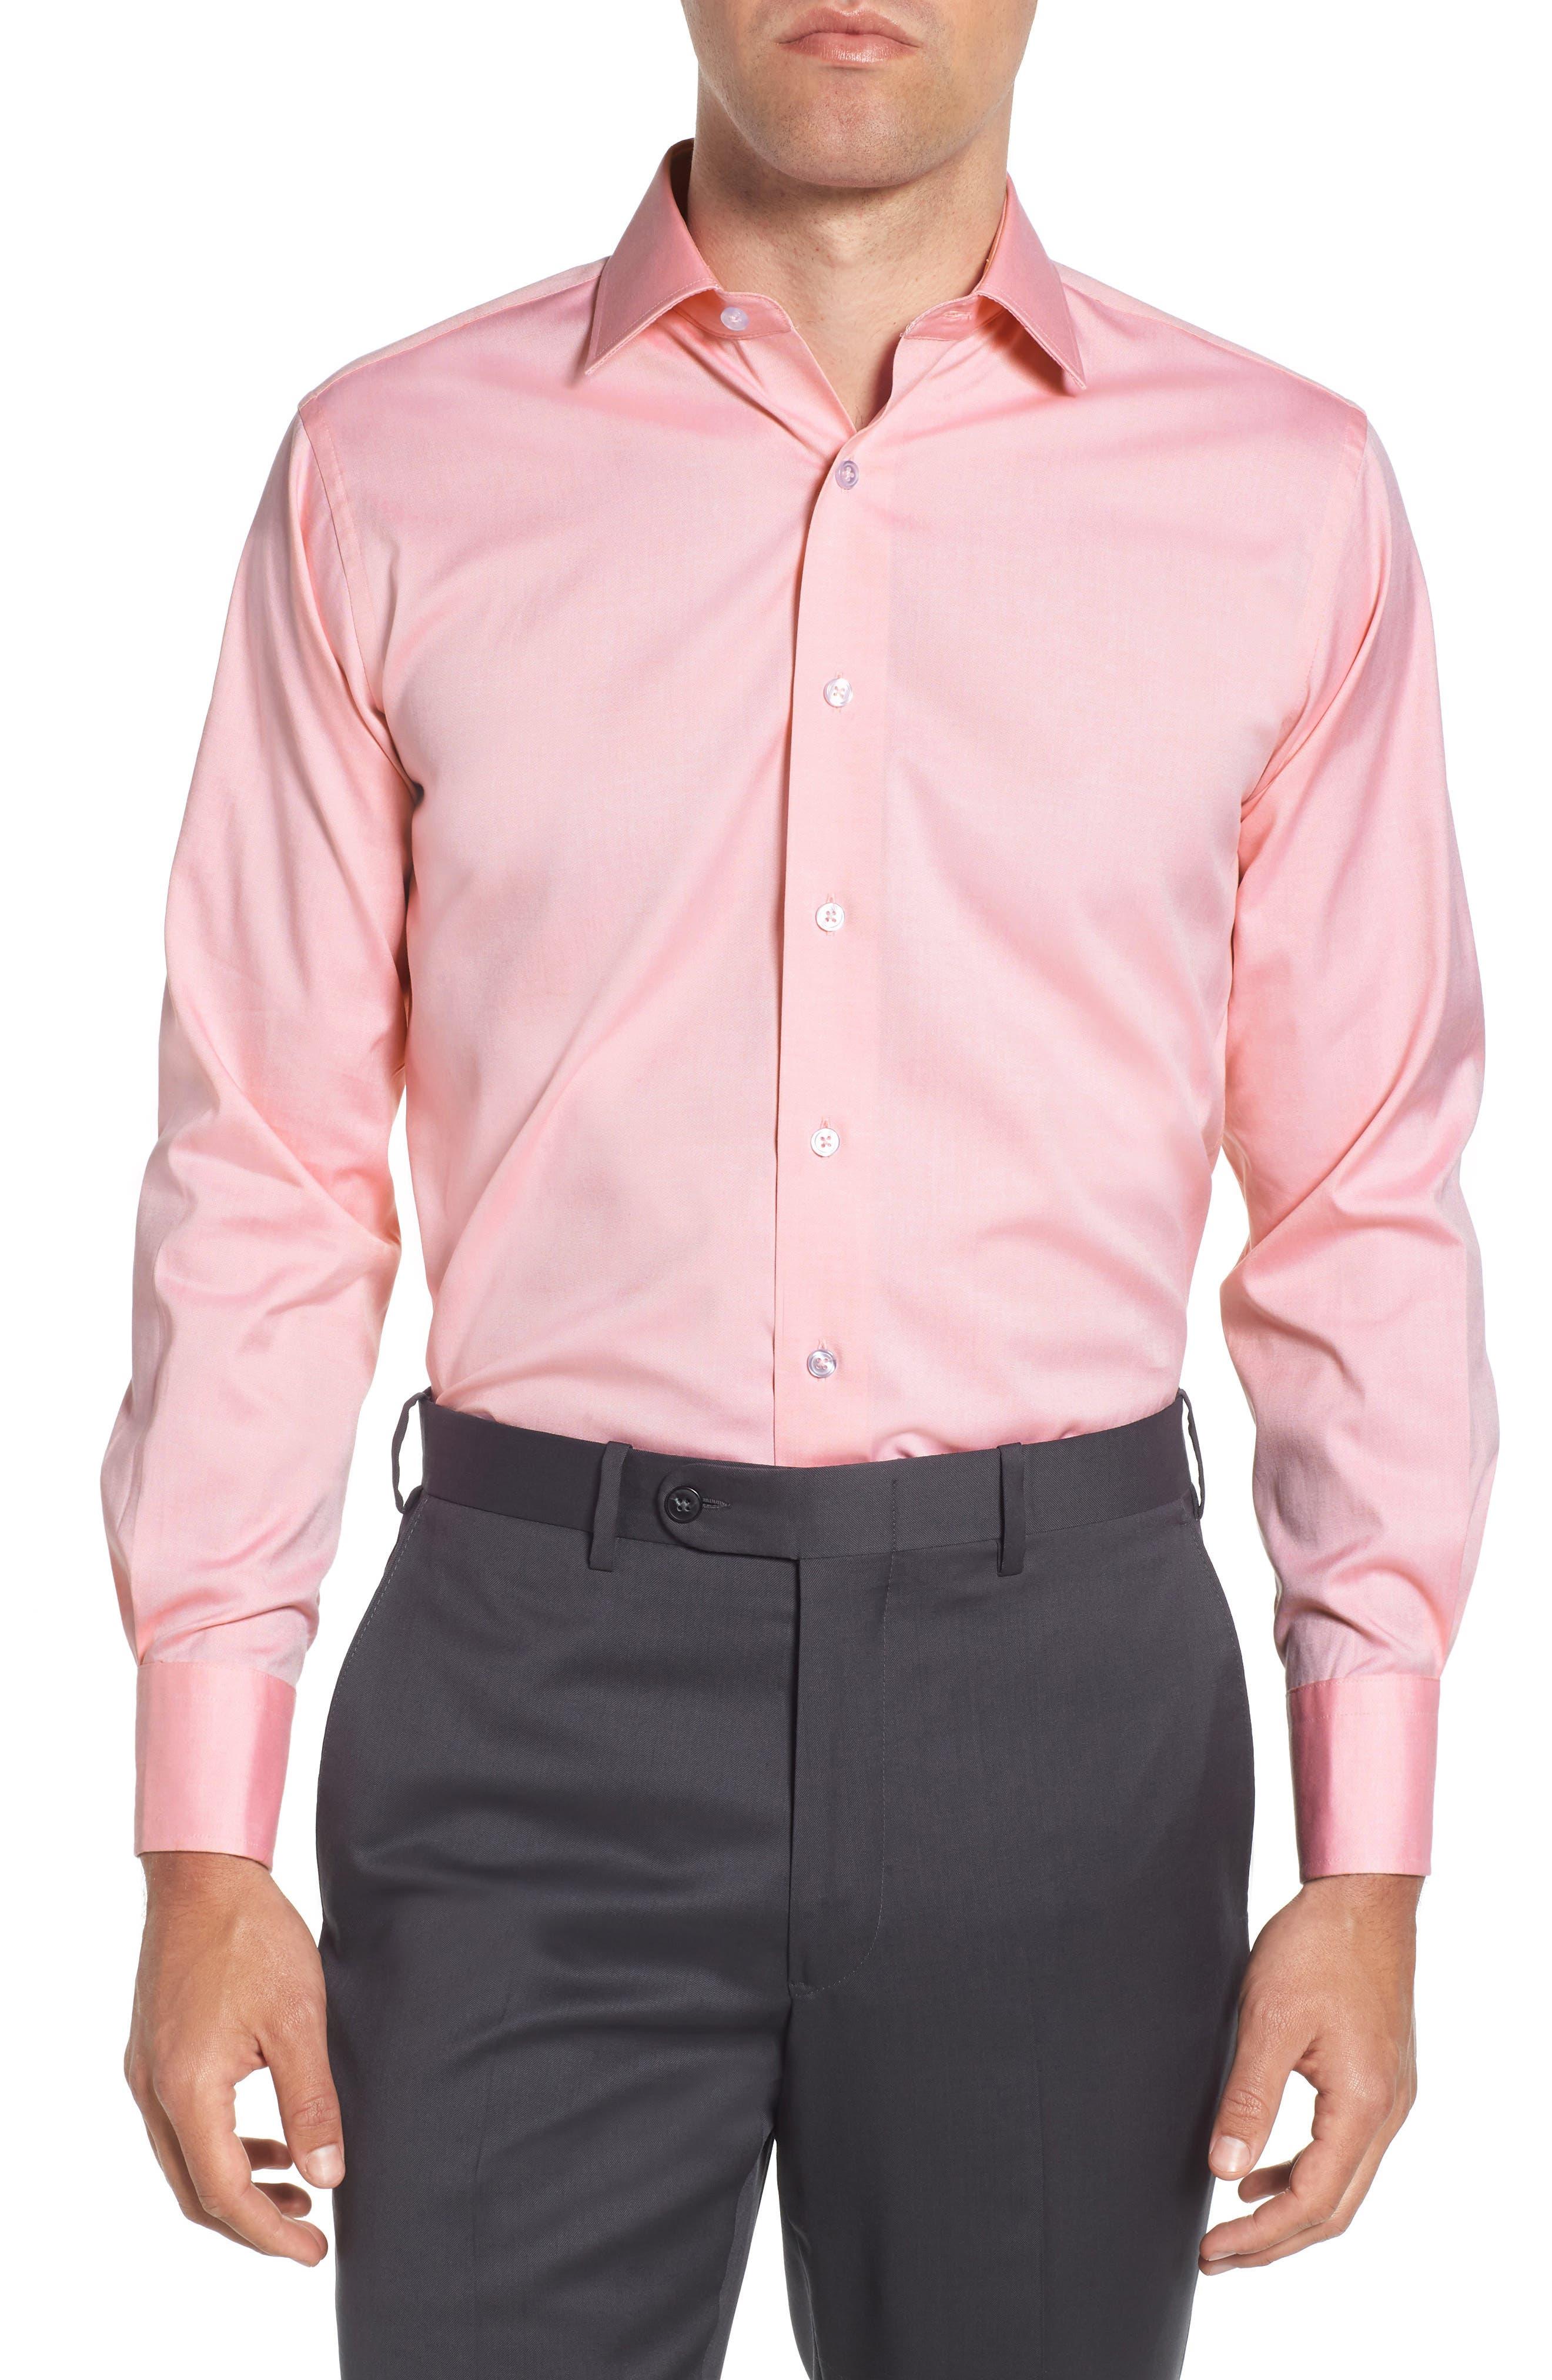 Trim Fit Solid Dress Shirt,                             Main thumbnail 1, color,                             PINK